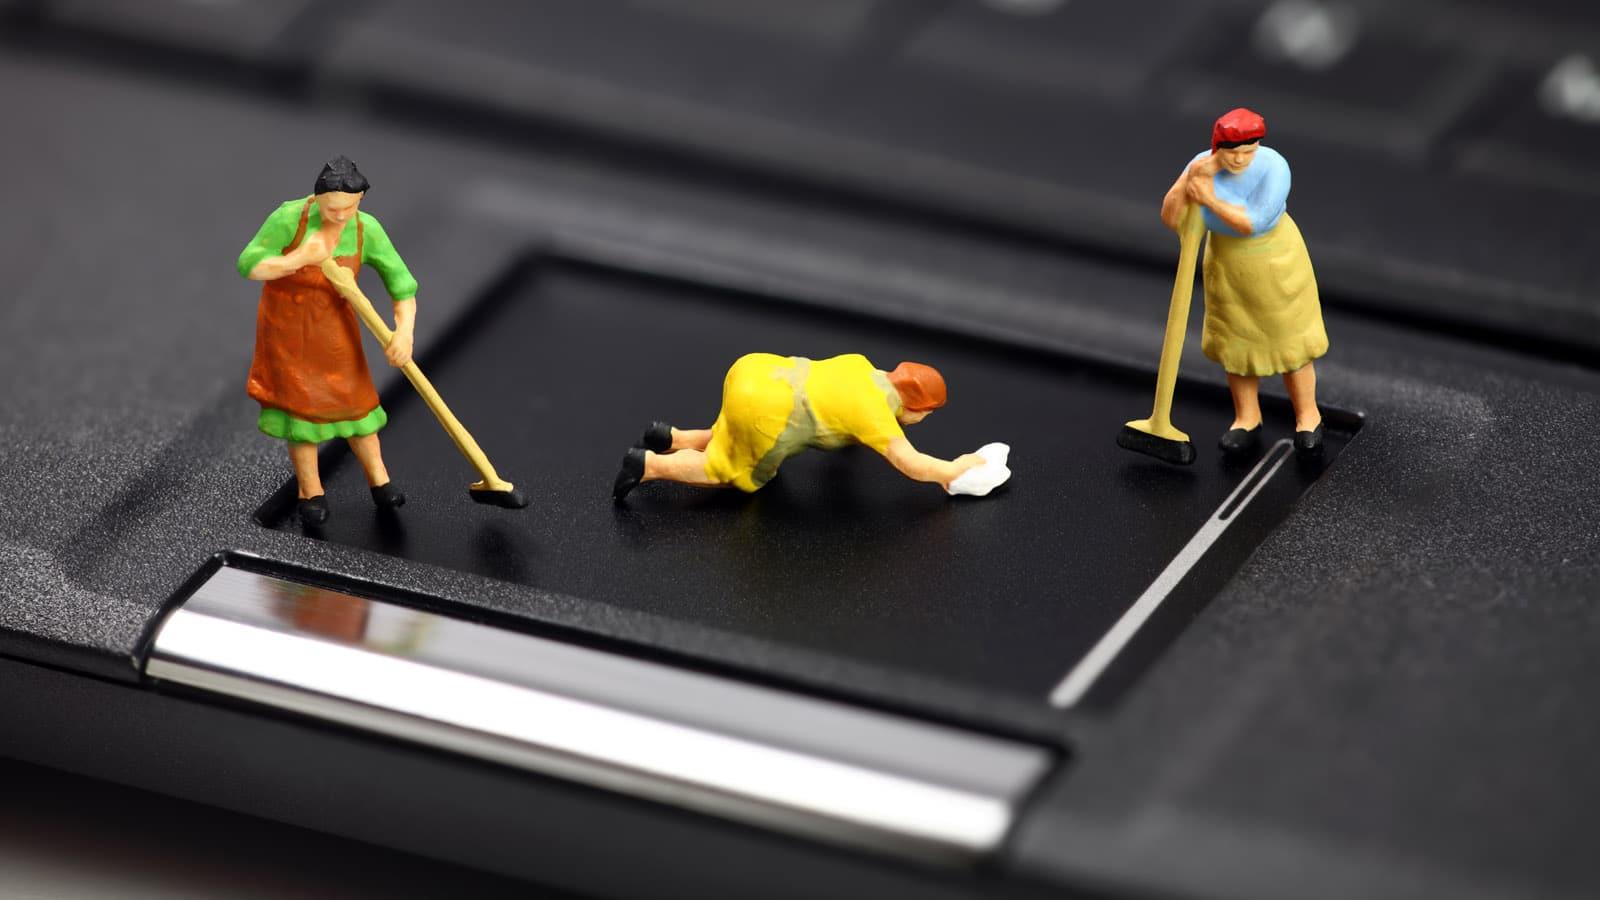 jasa bersih laptop bandung